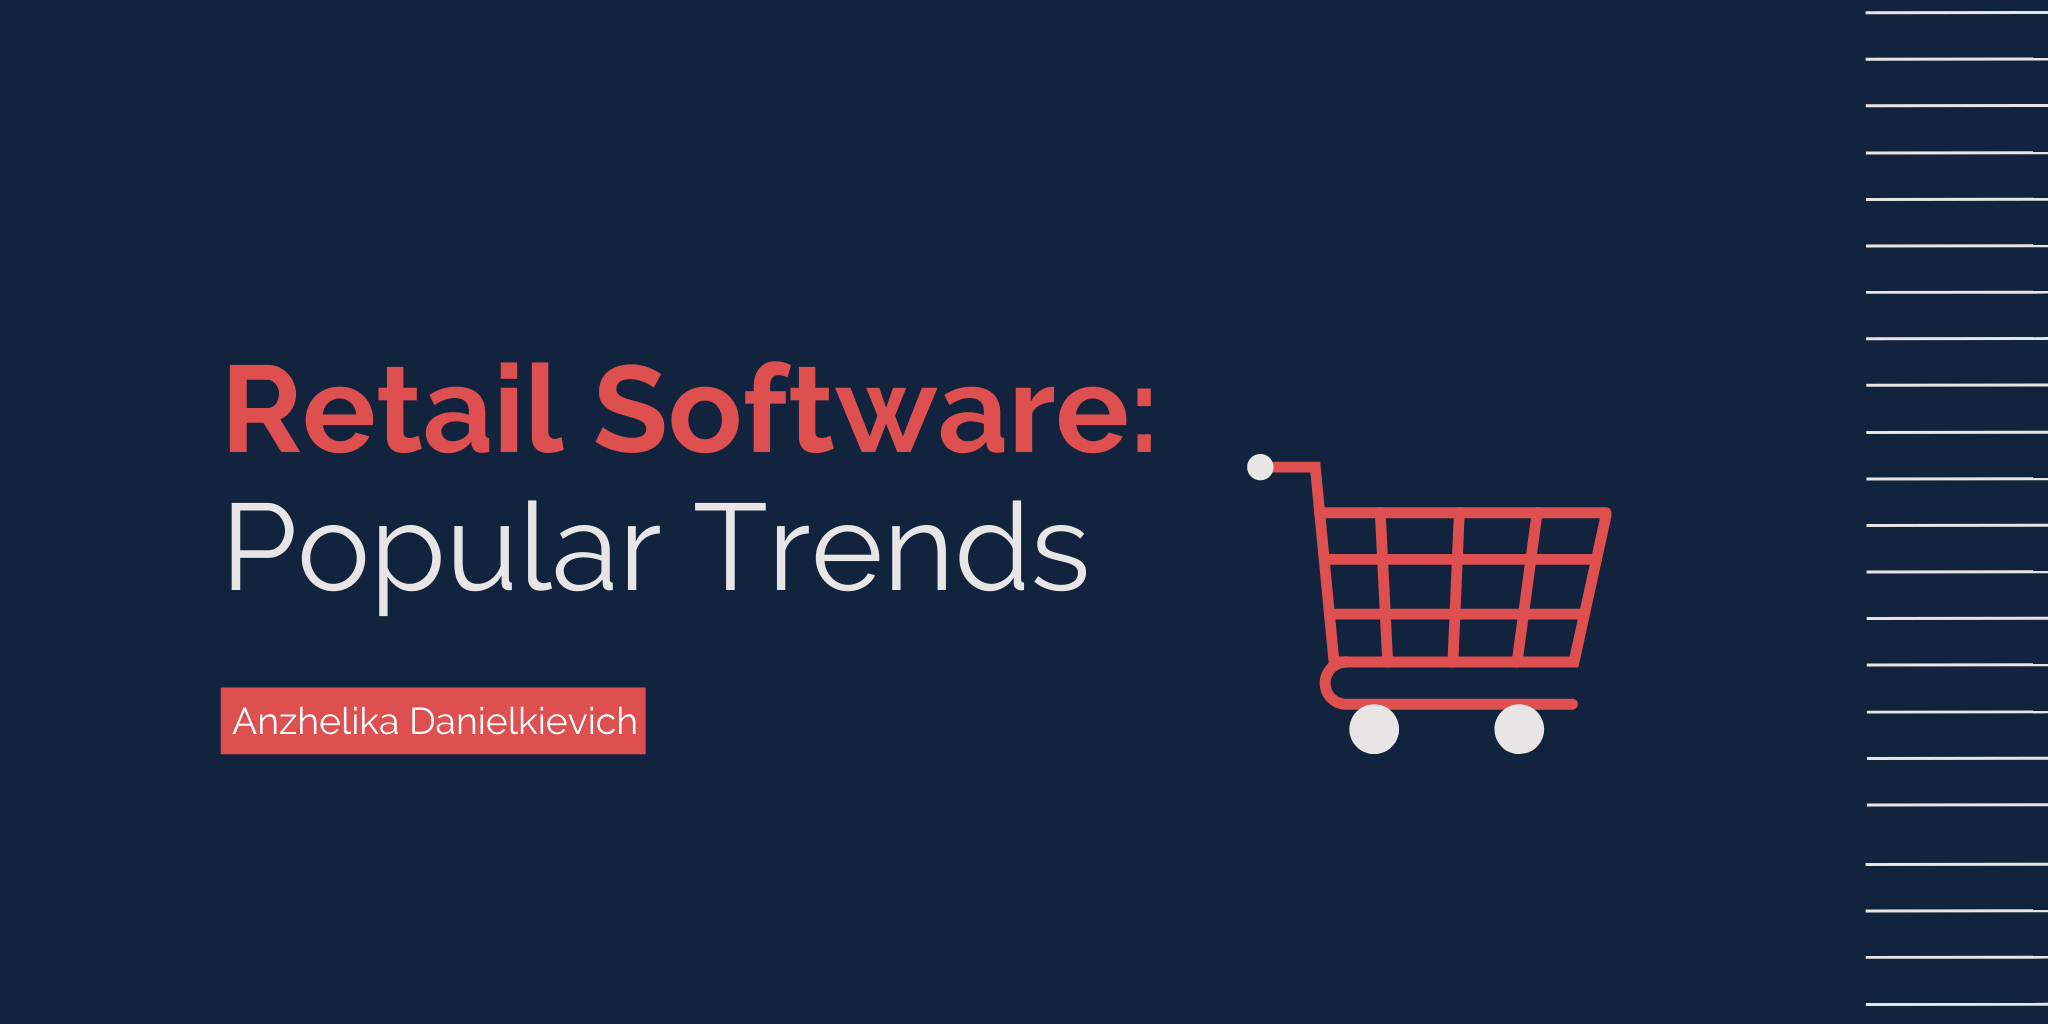 Retail Software: Popular Trends